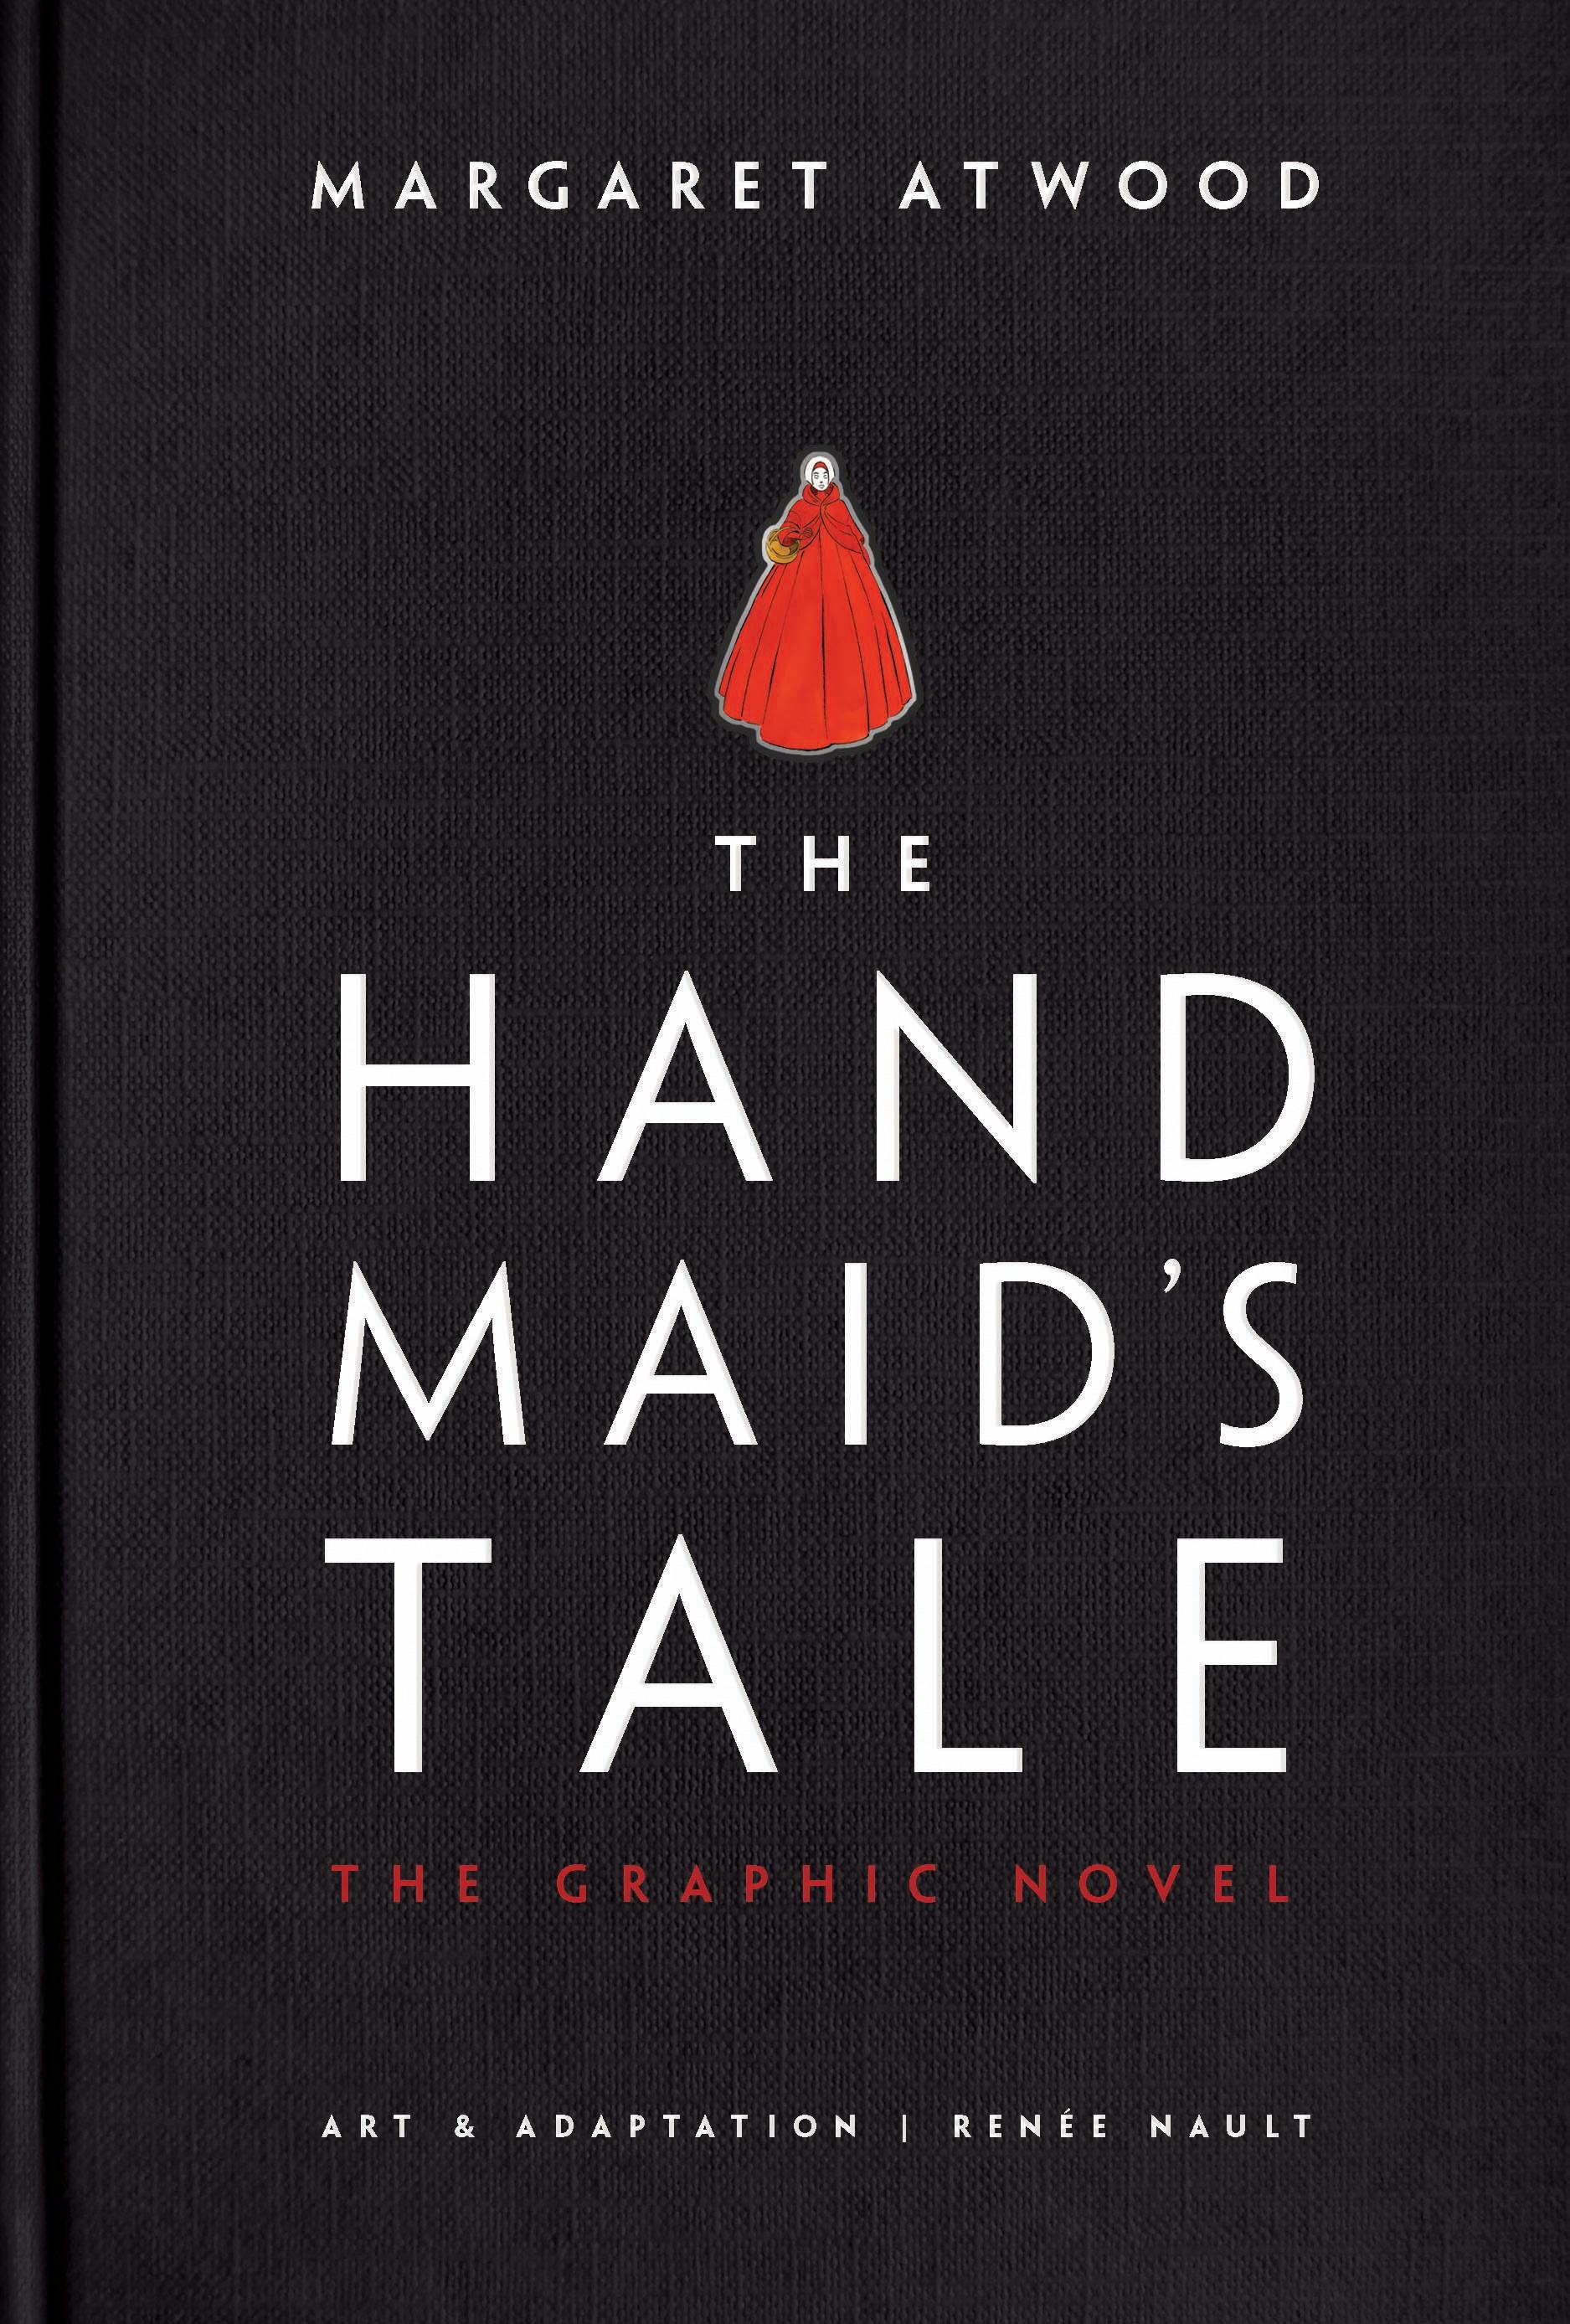 The Handmaid's Tale Graphic Novel (1).jpg